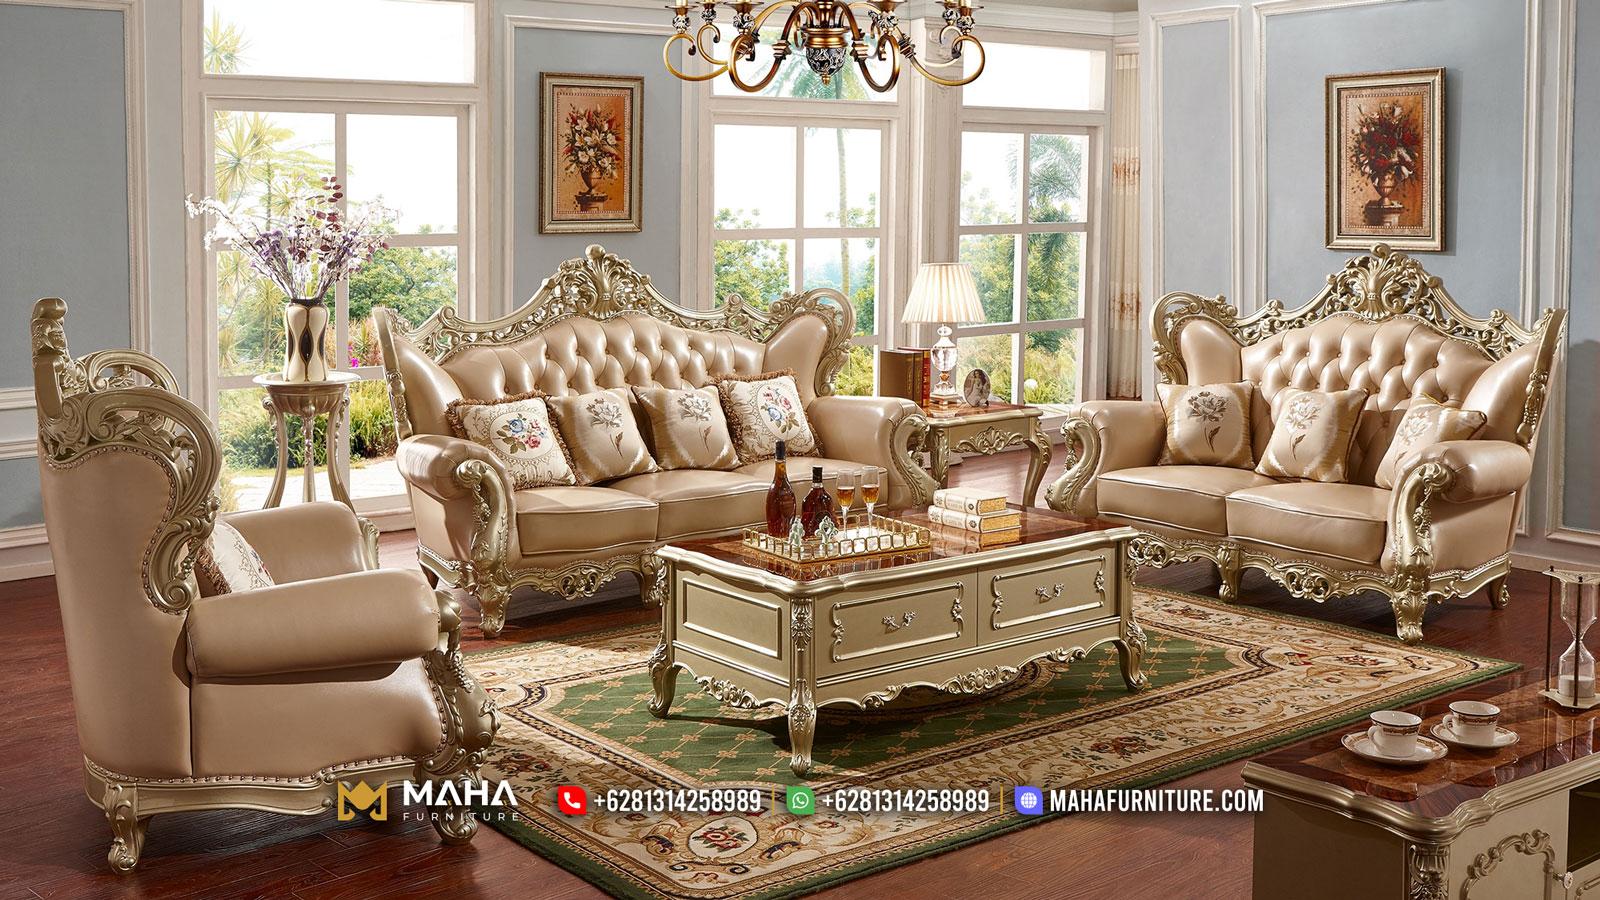 Harga Sofa Tamu Jepara Luxury Carving New Golden Leaf Color Excellent MF14